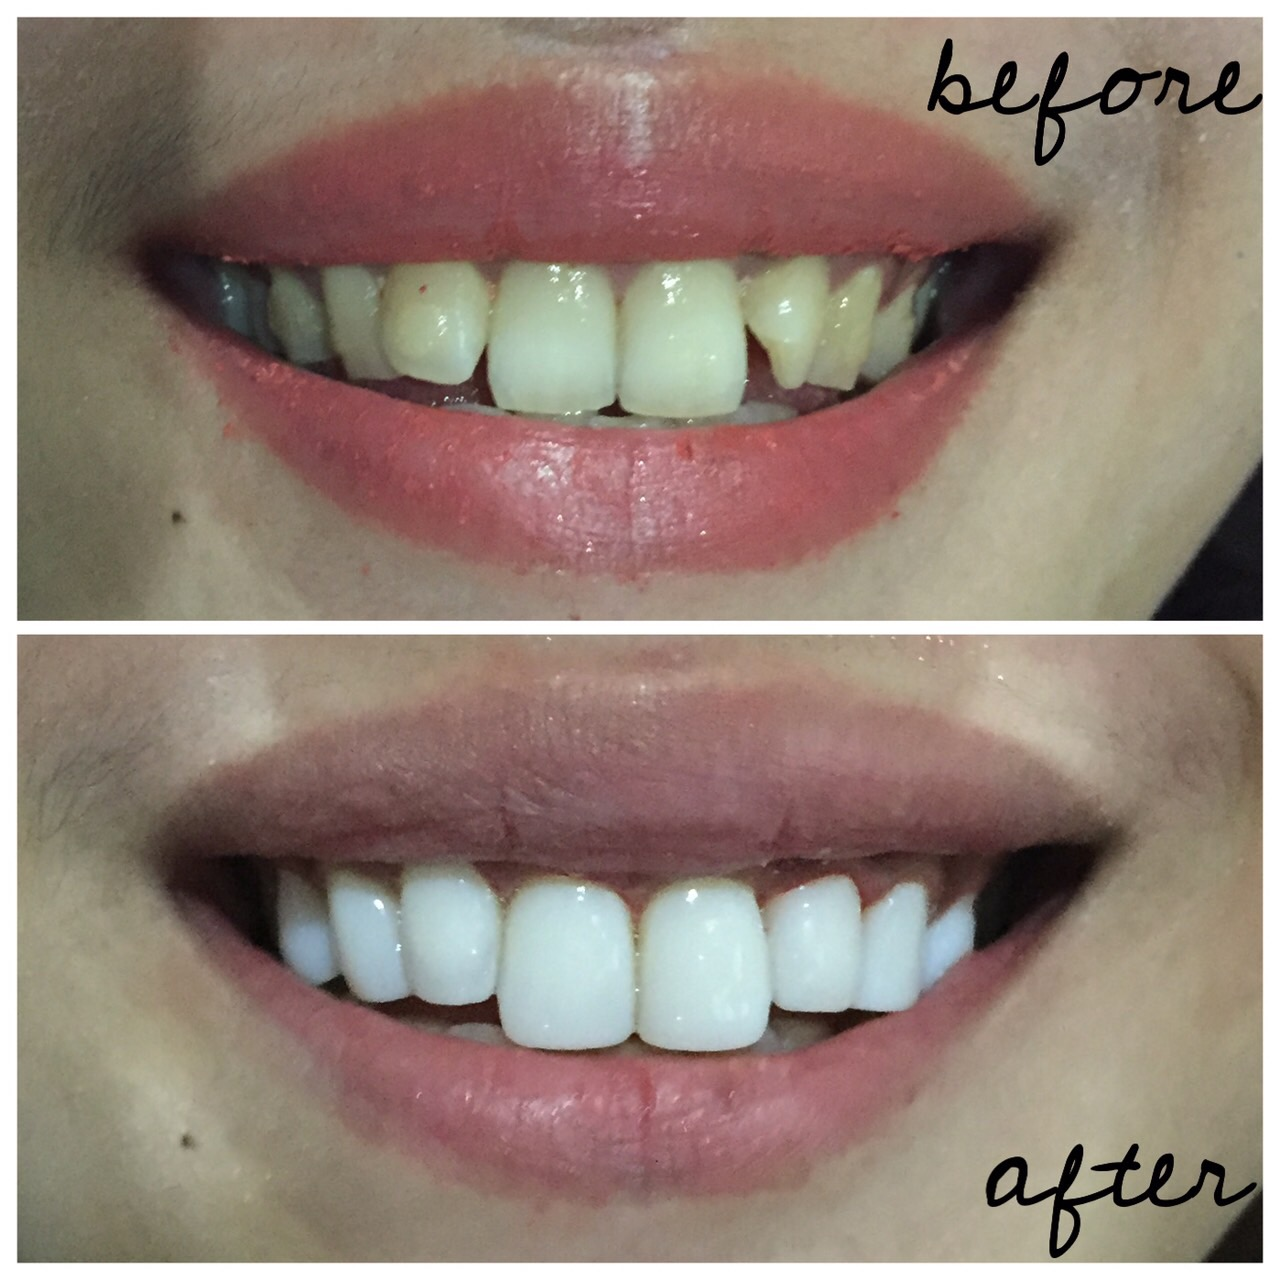 apa itu veneer gigi ancora store u2022 rh ancora store apa itu veneer gigi dan berapa biayanya apa itu veneer gigi kelinci